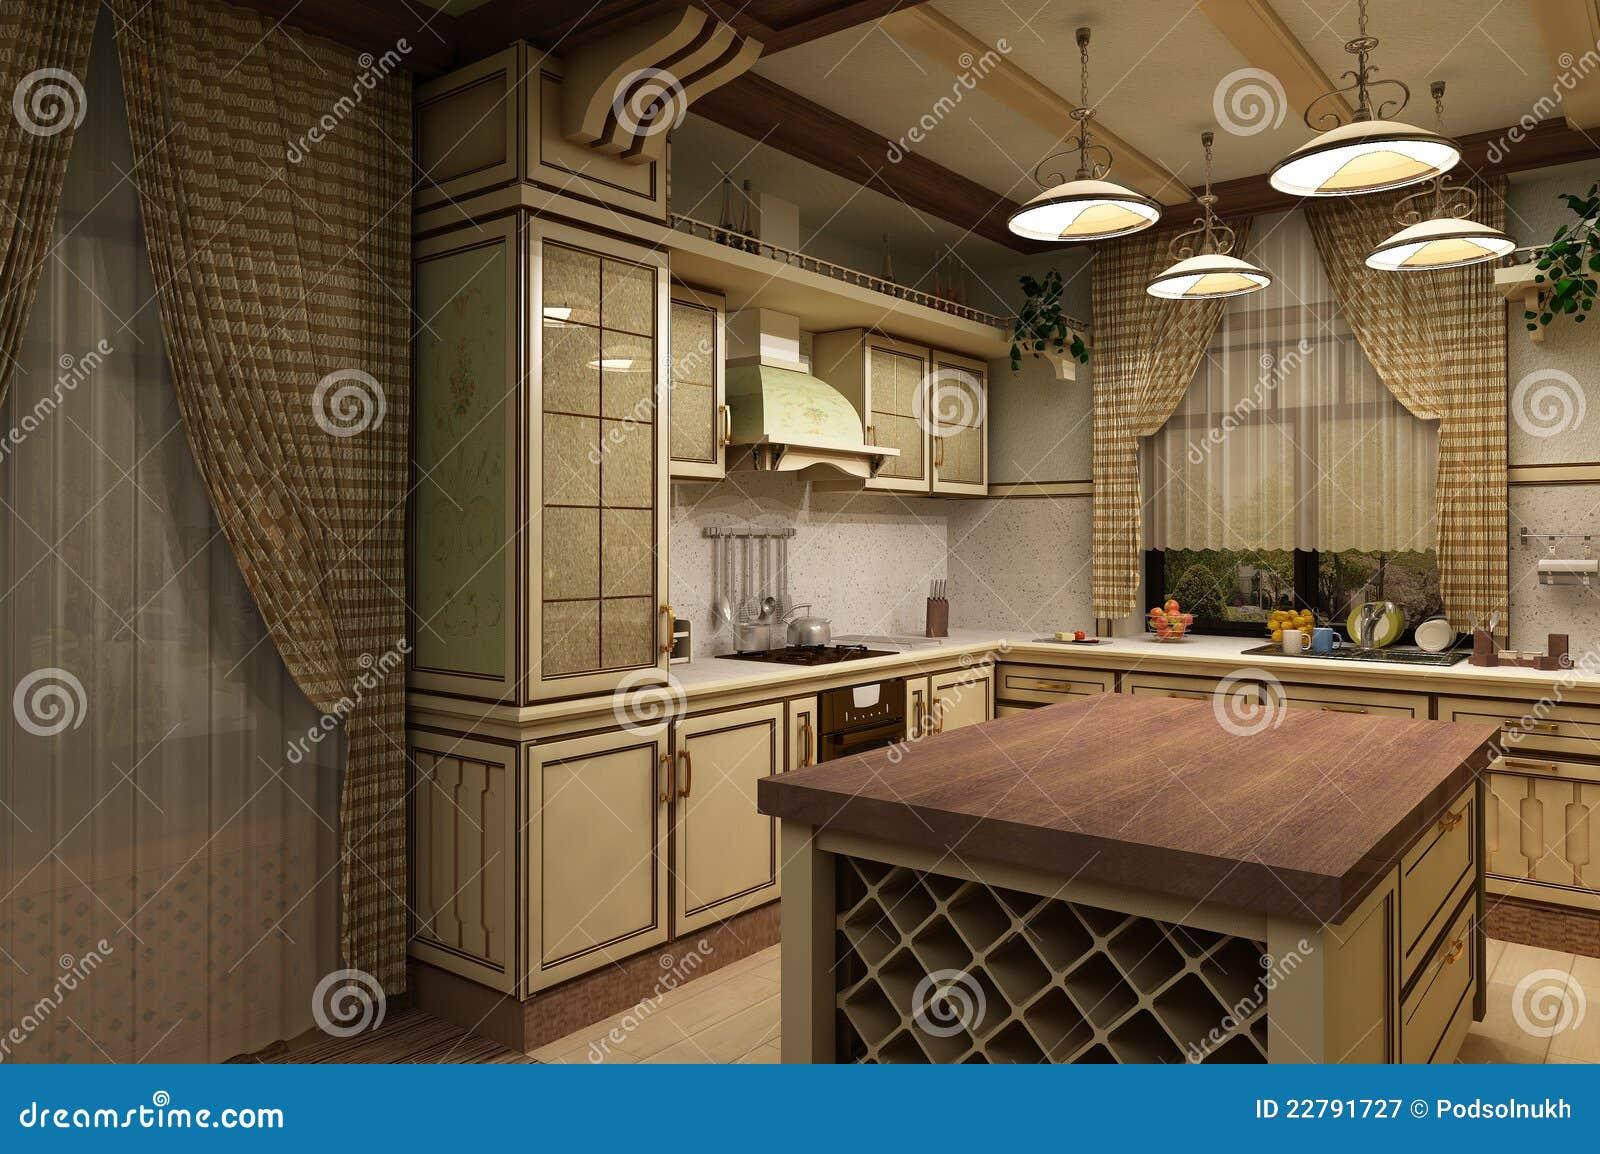 Kamer kleur grijs - Oude stijl keuken wastafel ...